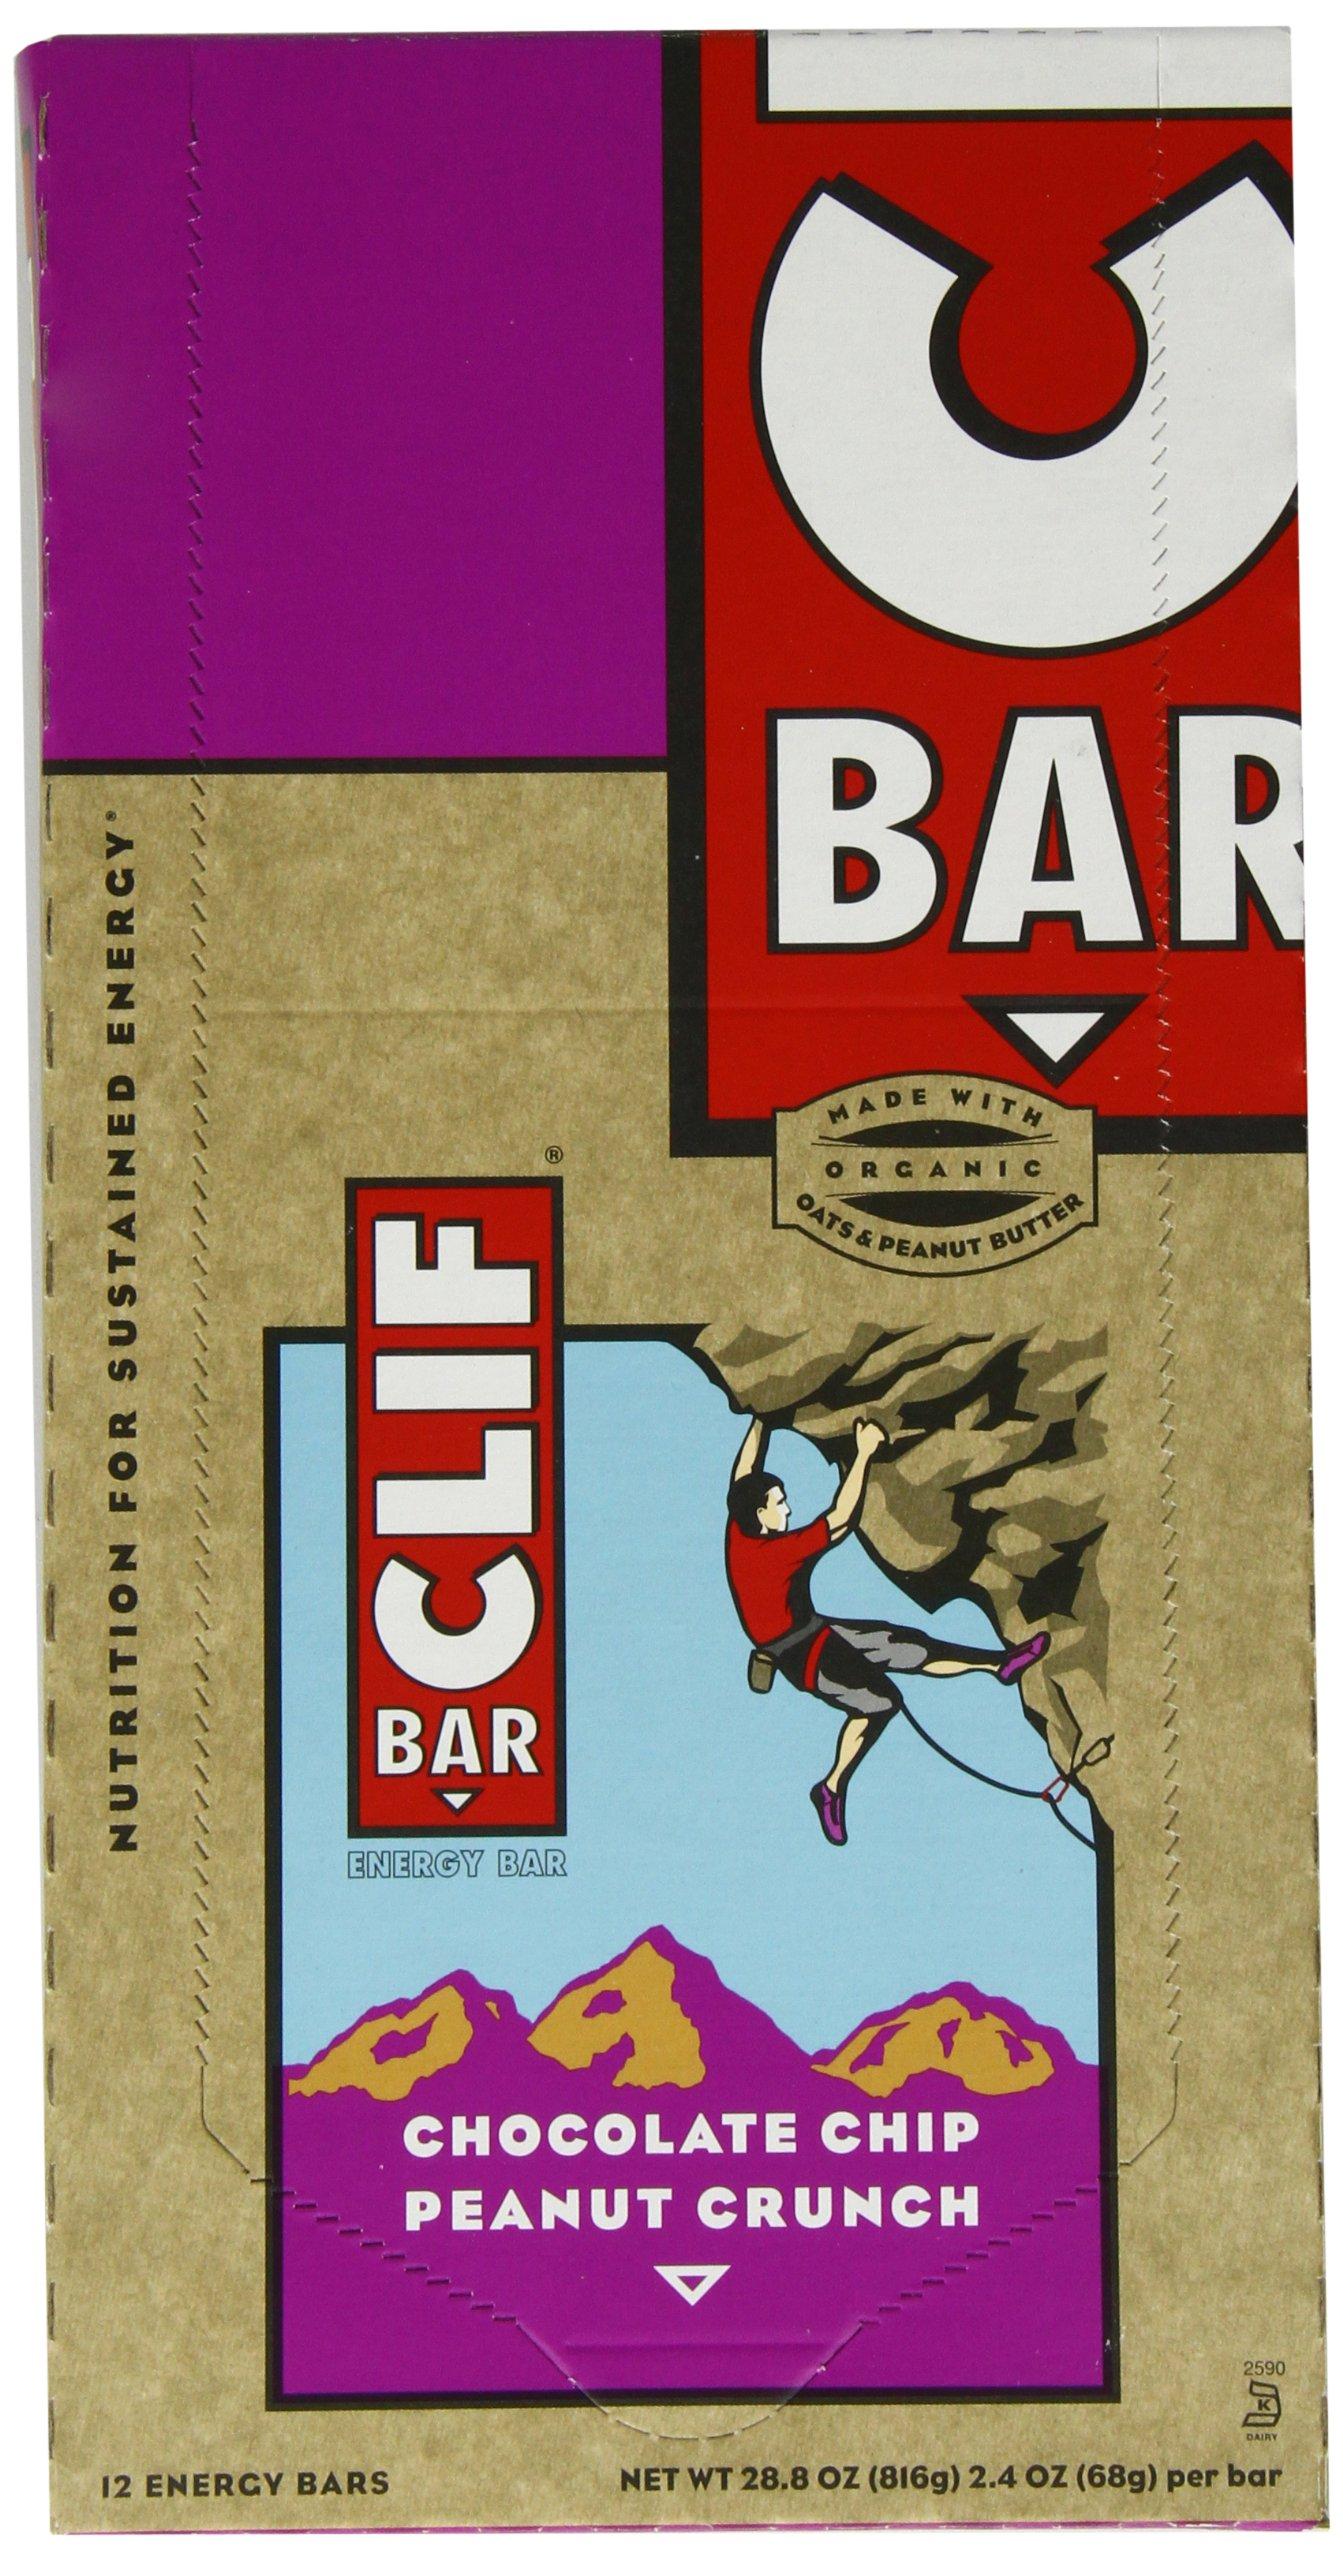 Clif Bars: Chocolate Chip Peanut Crunch by Clif Bar